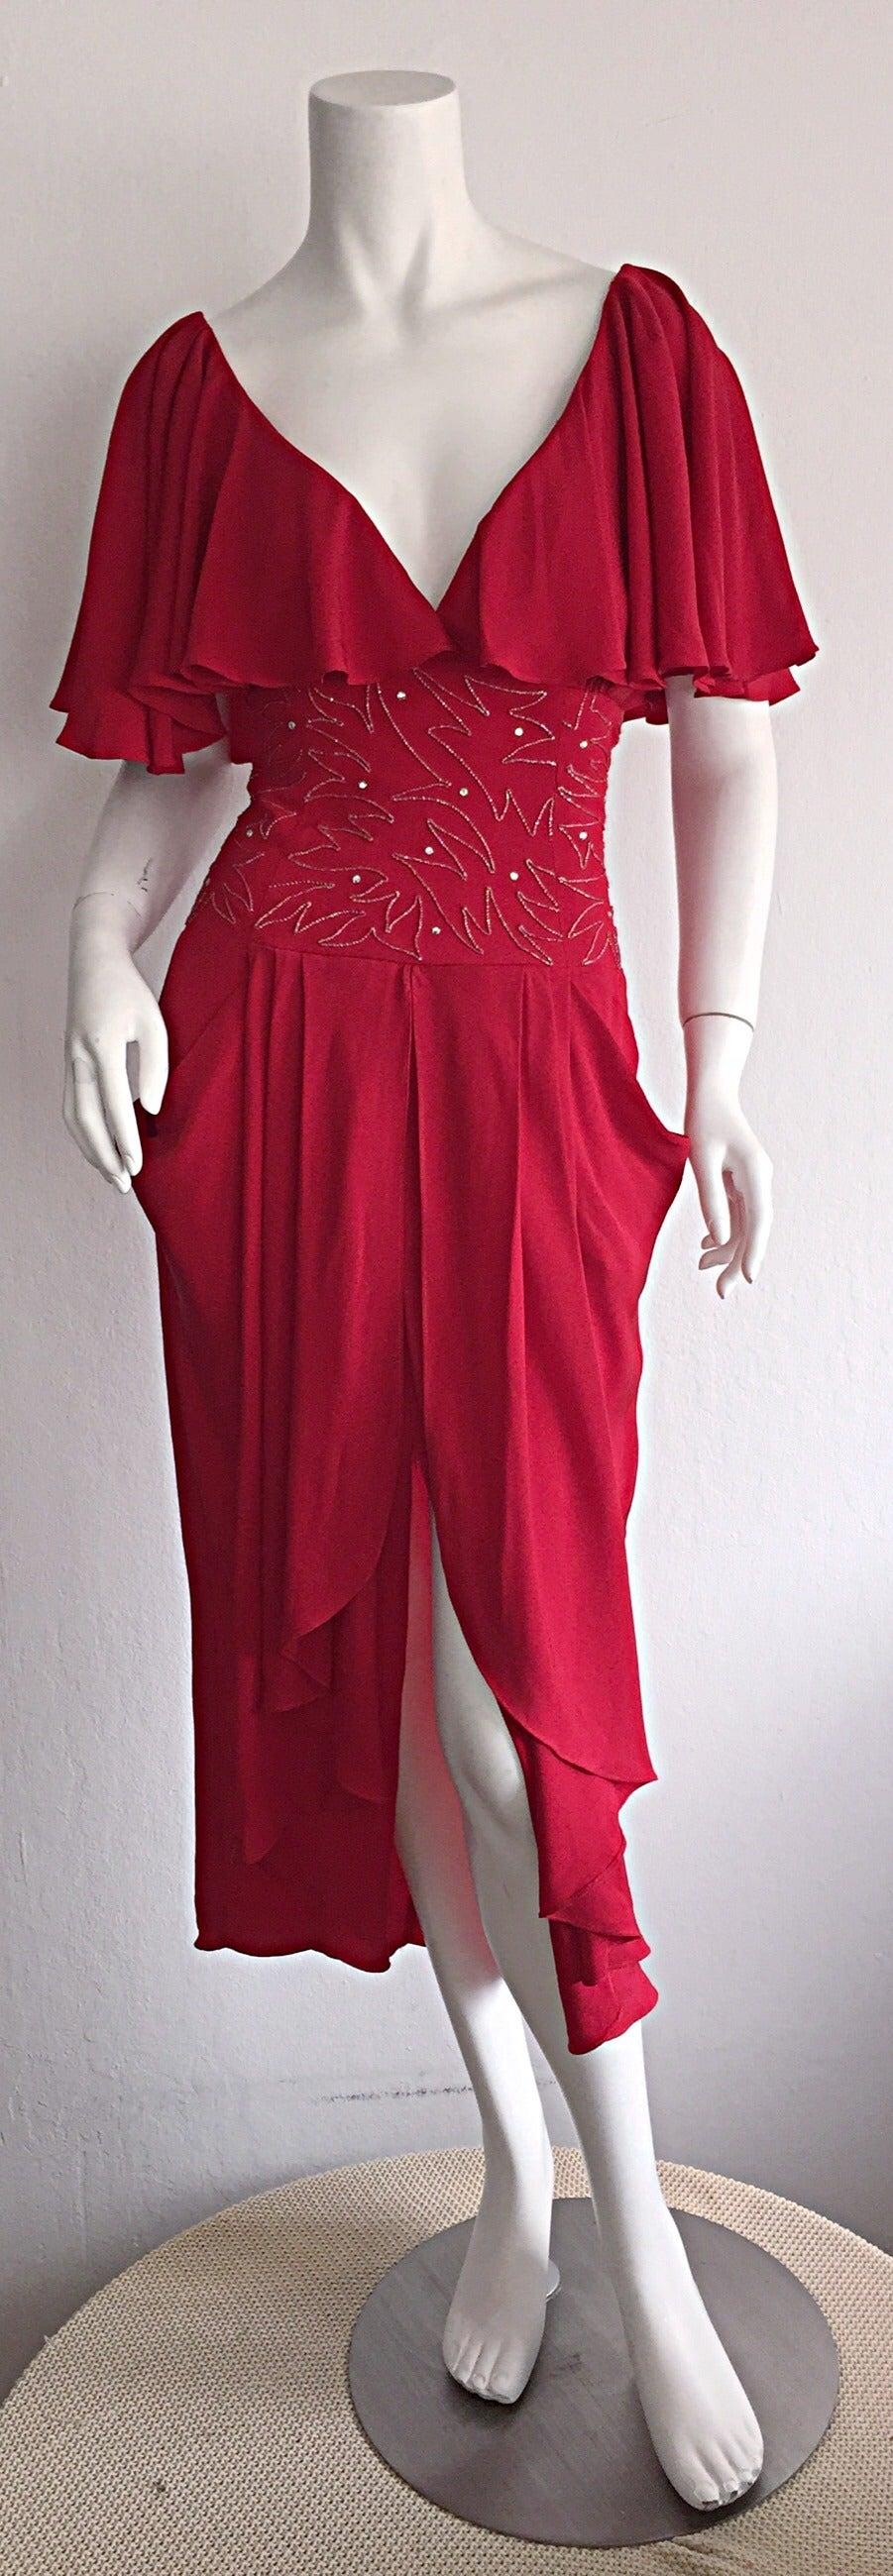 Beautiful Vintage Eletra Casadei Lipstick Red Flutter Dress w/ Rhinestones For Sale 3